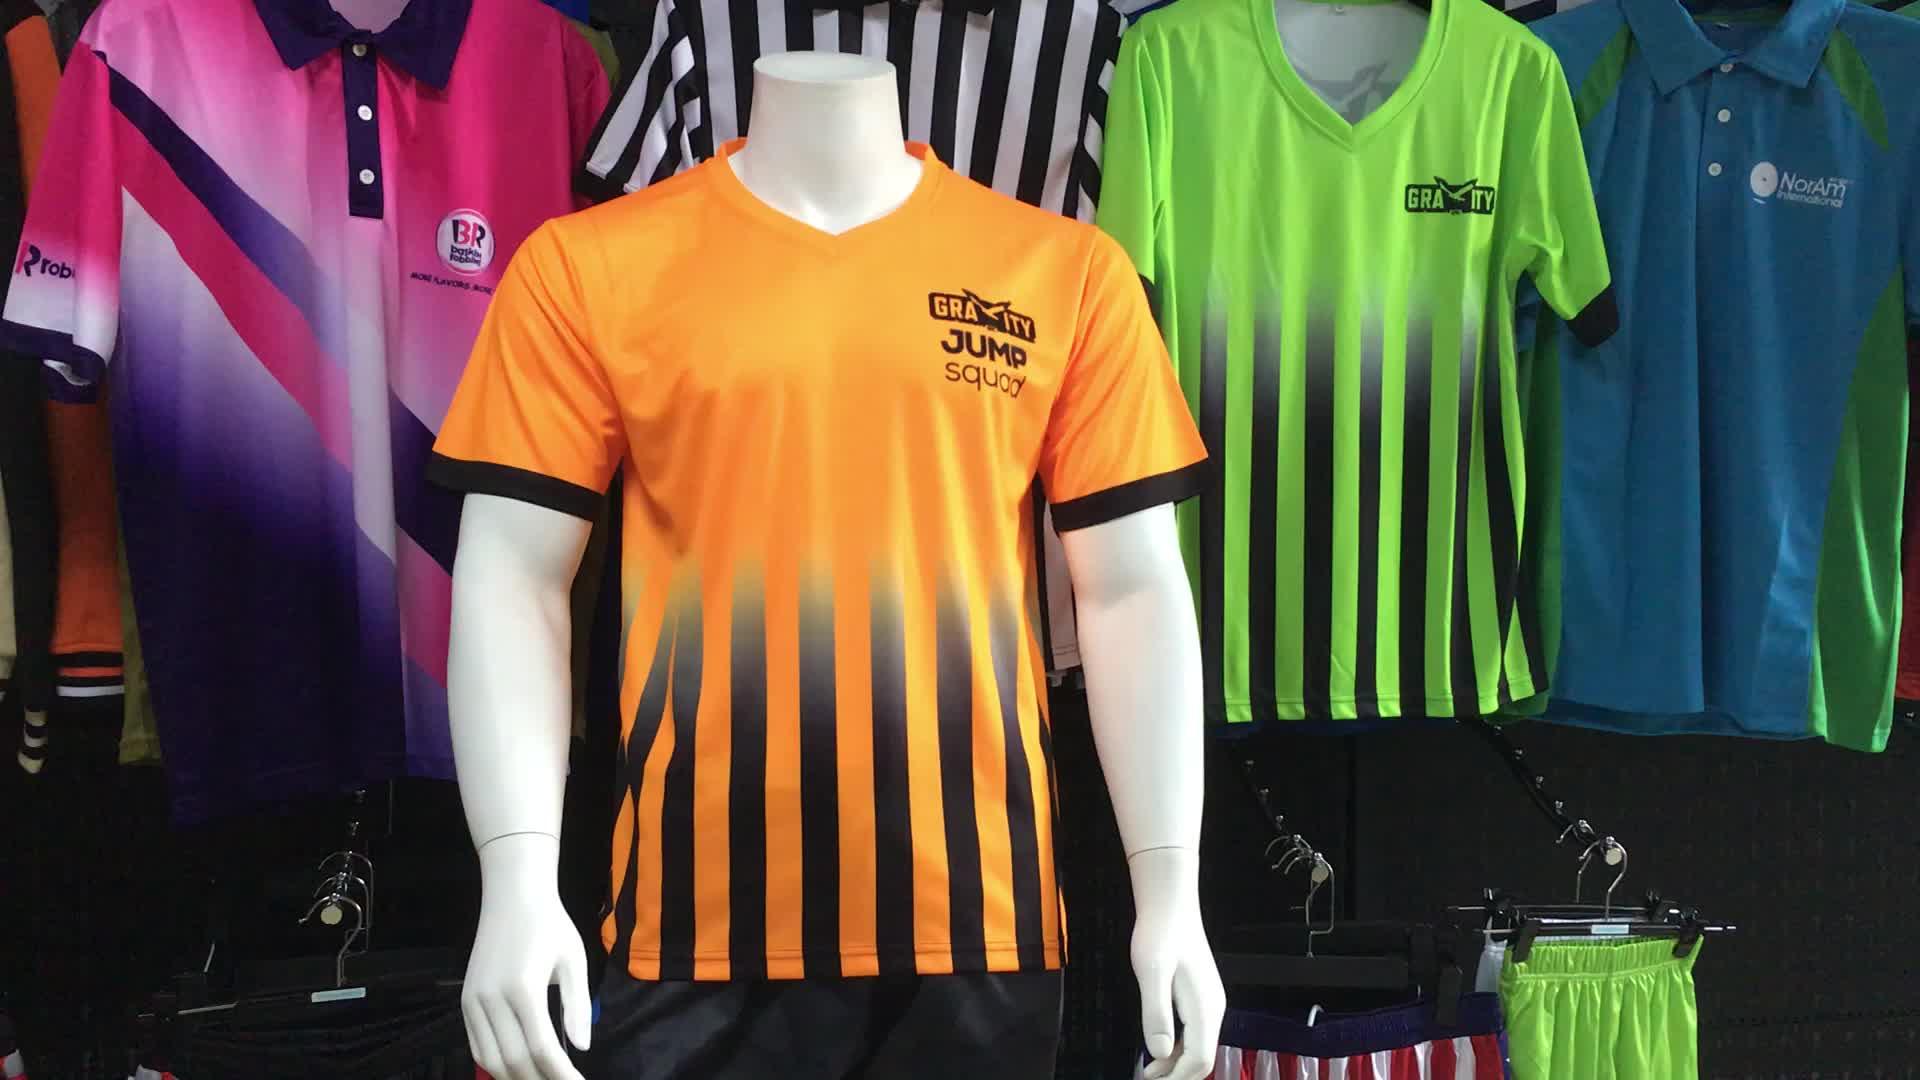 Färben Sie Sublimationspolyestergolfpoloshirts / Mans kundengebundenes Golfpolo Jersey / volles Drucken Stickereigolfpolo-Kleid